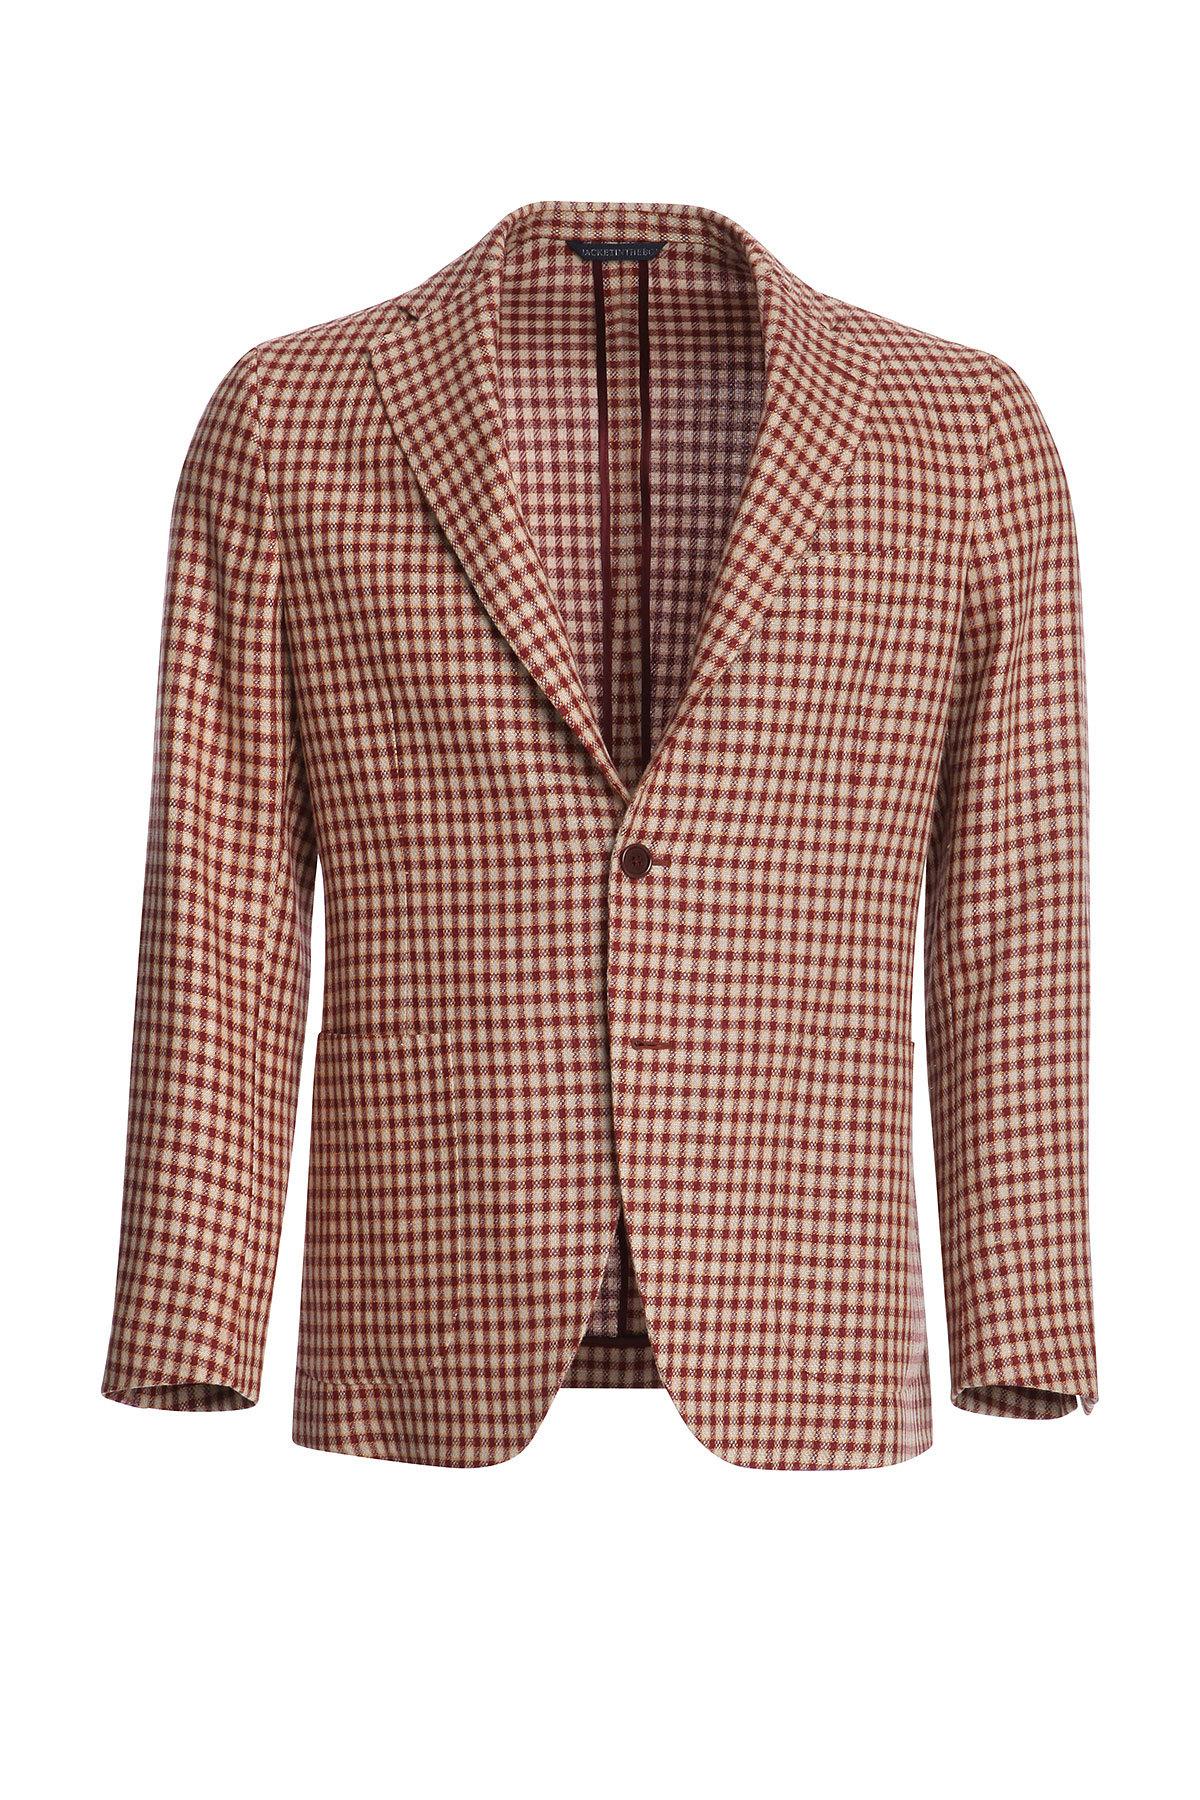 uno uno elegante spacco elegante uno giacca spacco giacca giacca qxCPUTw 142e3b971c37